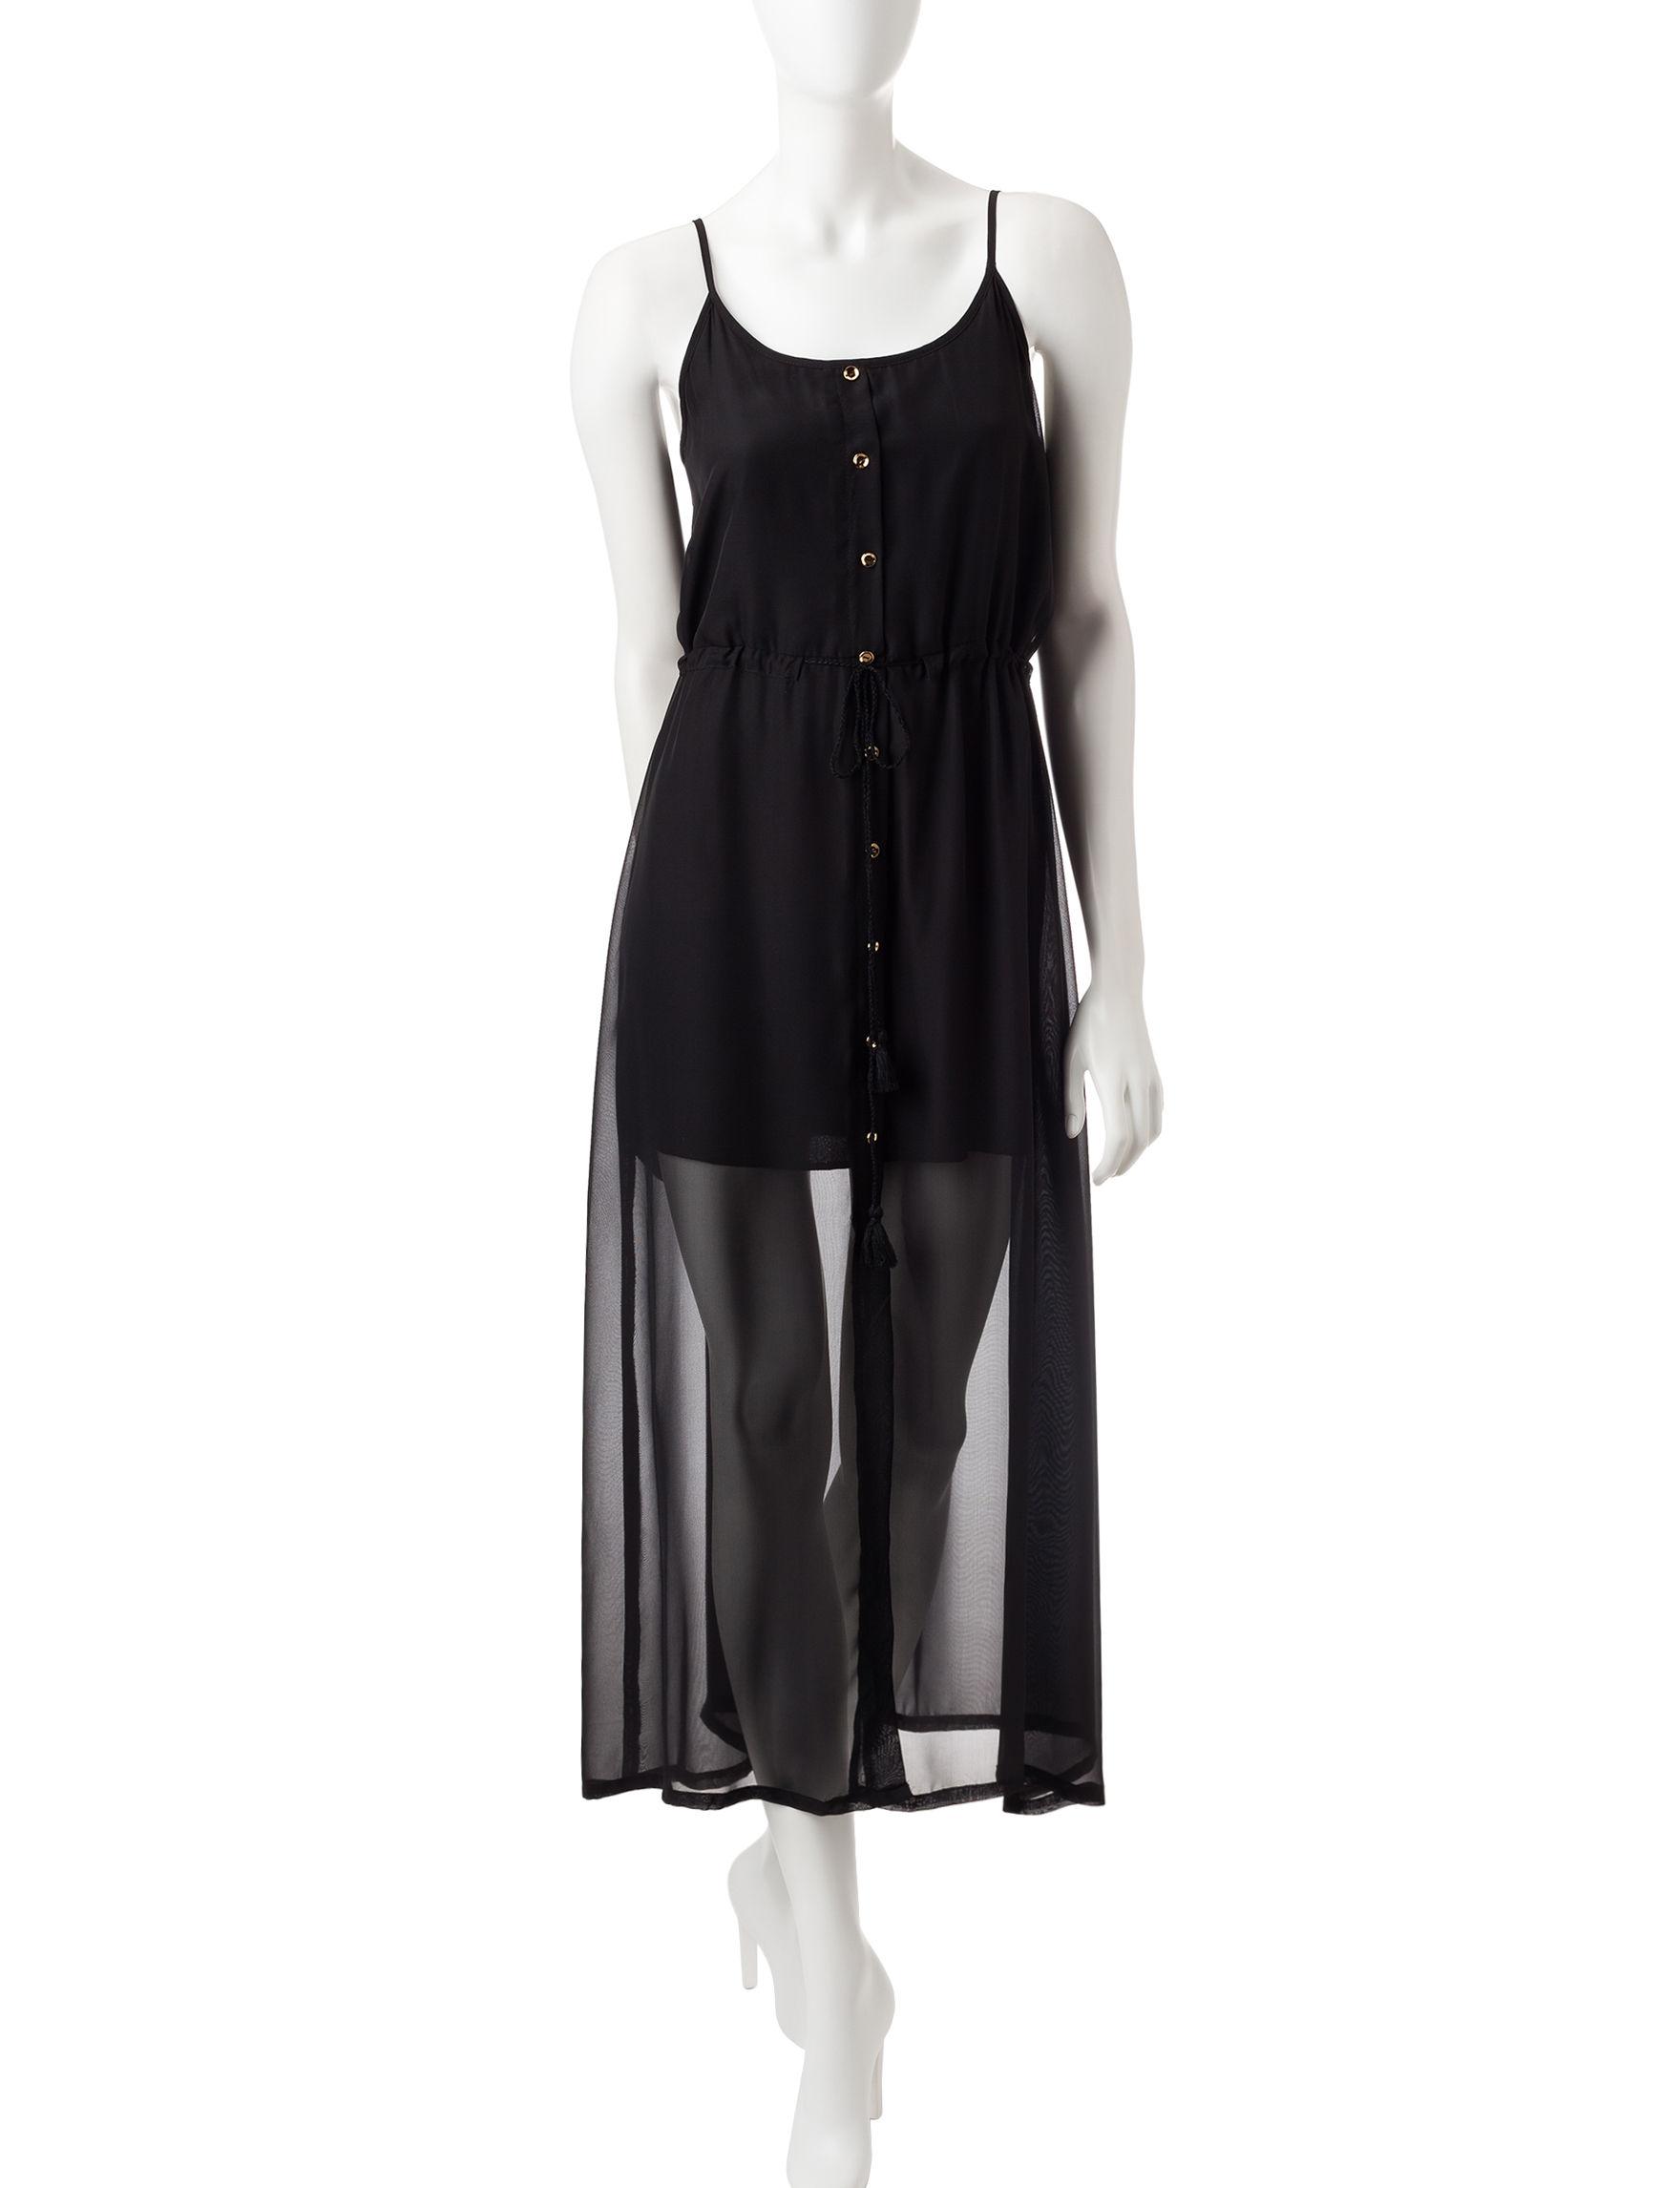 Wishful Park Black Everyday & Casual Sundresses